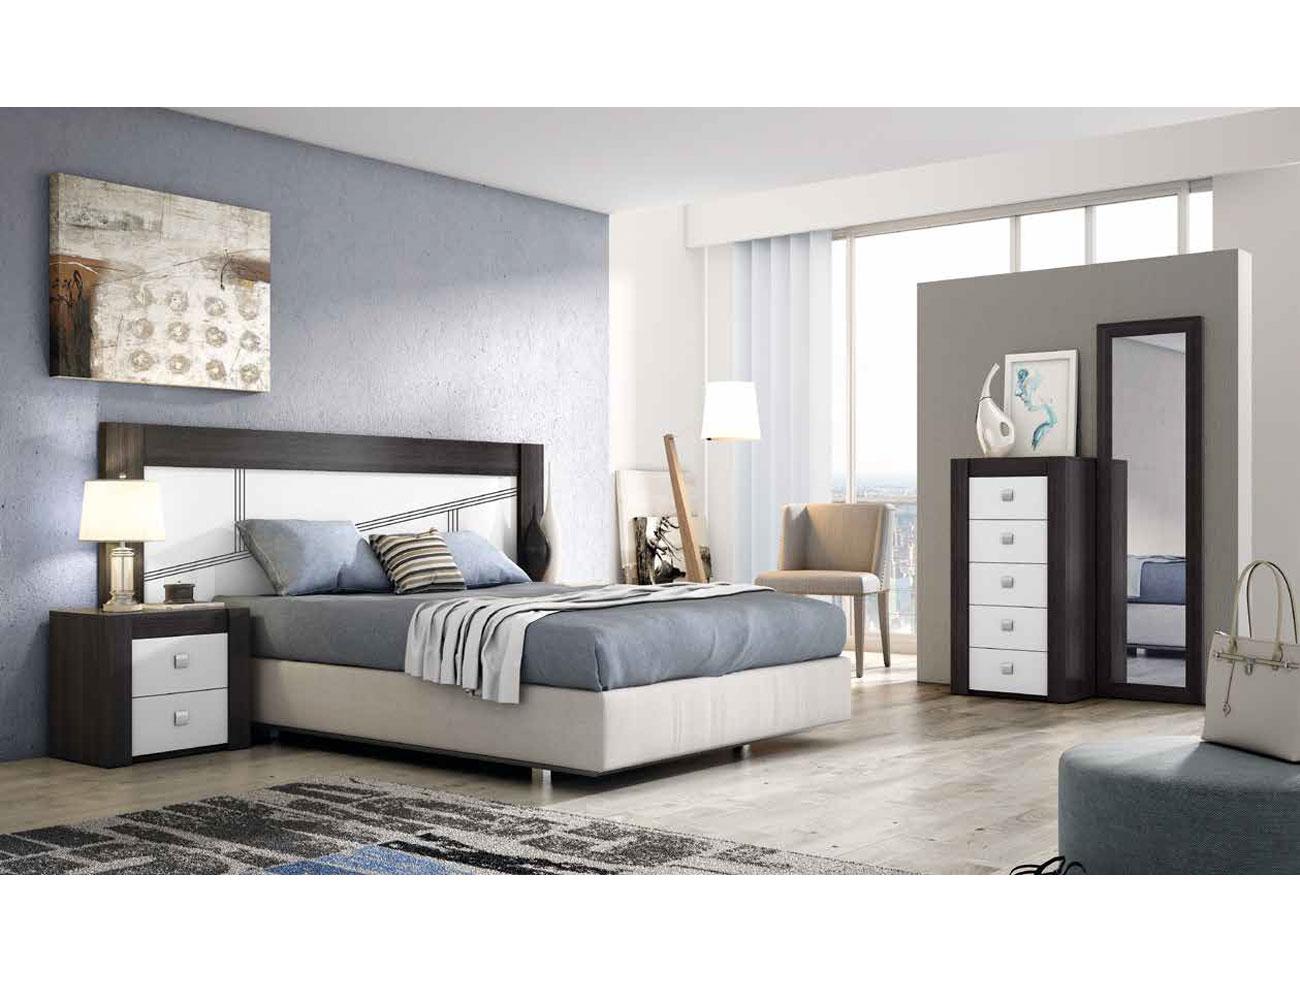 Dormitorio moderno ceniza blanco 04b